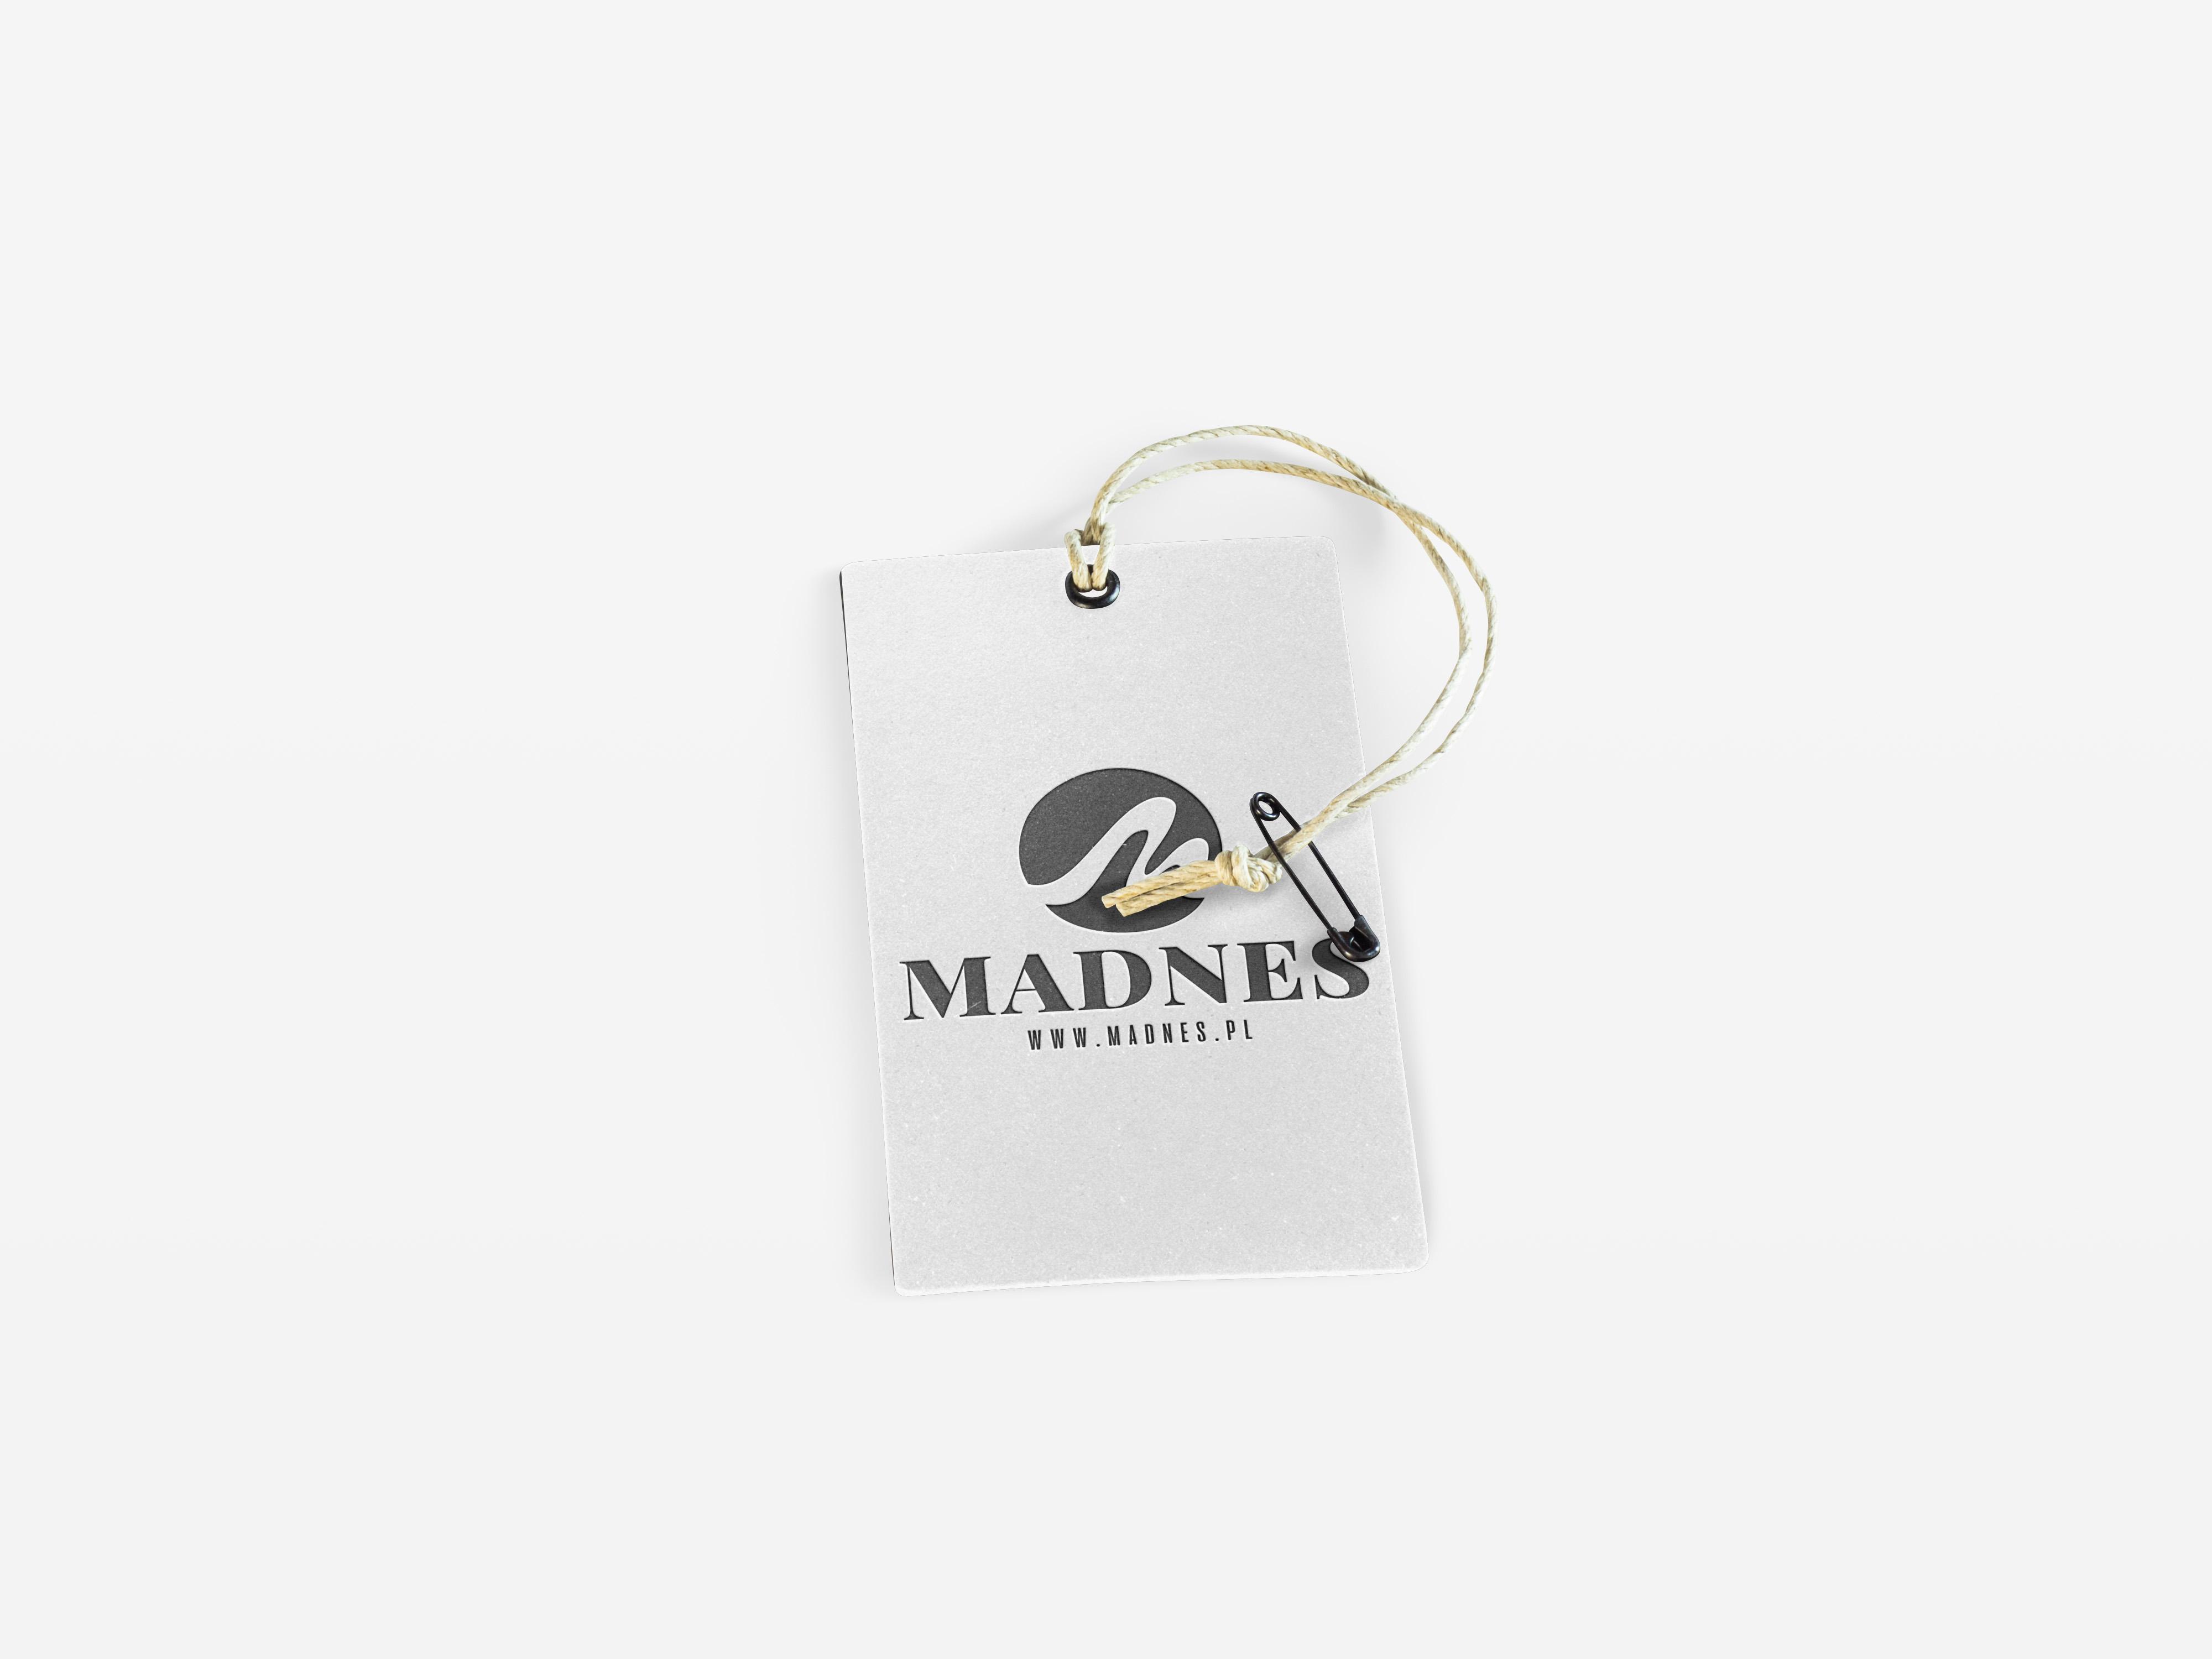 Madnes_branding_3